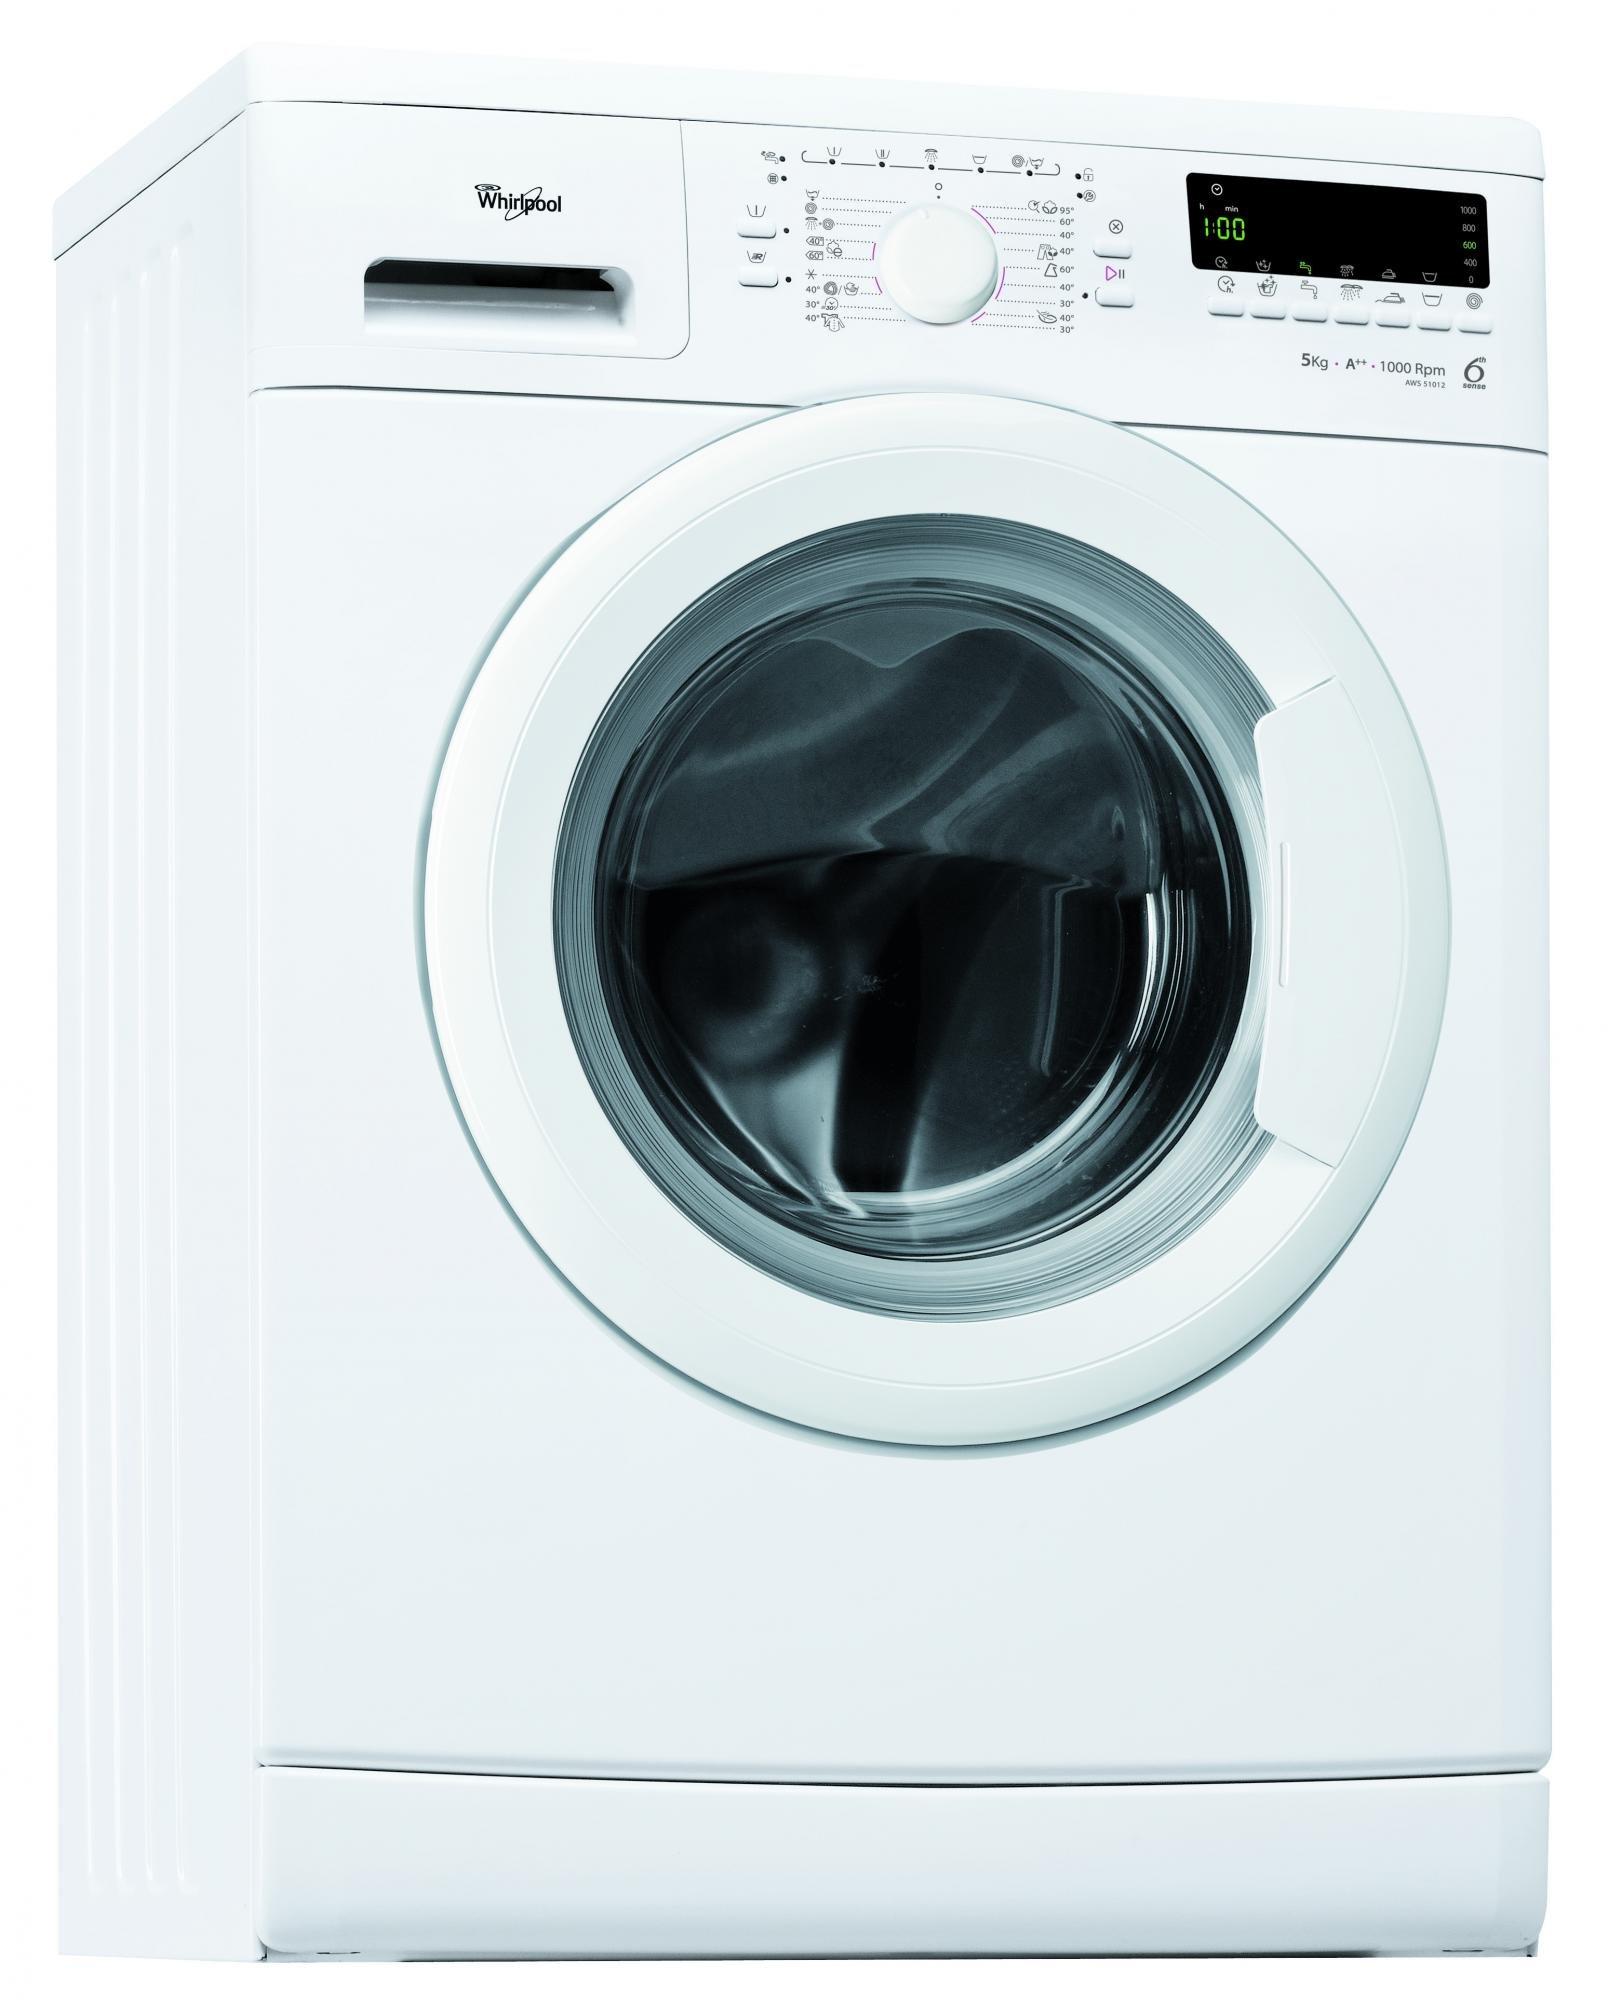 Whirlpool AWS 51012 + dárek dle vlastního výběru zdarma!!!